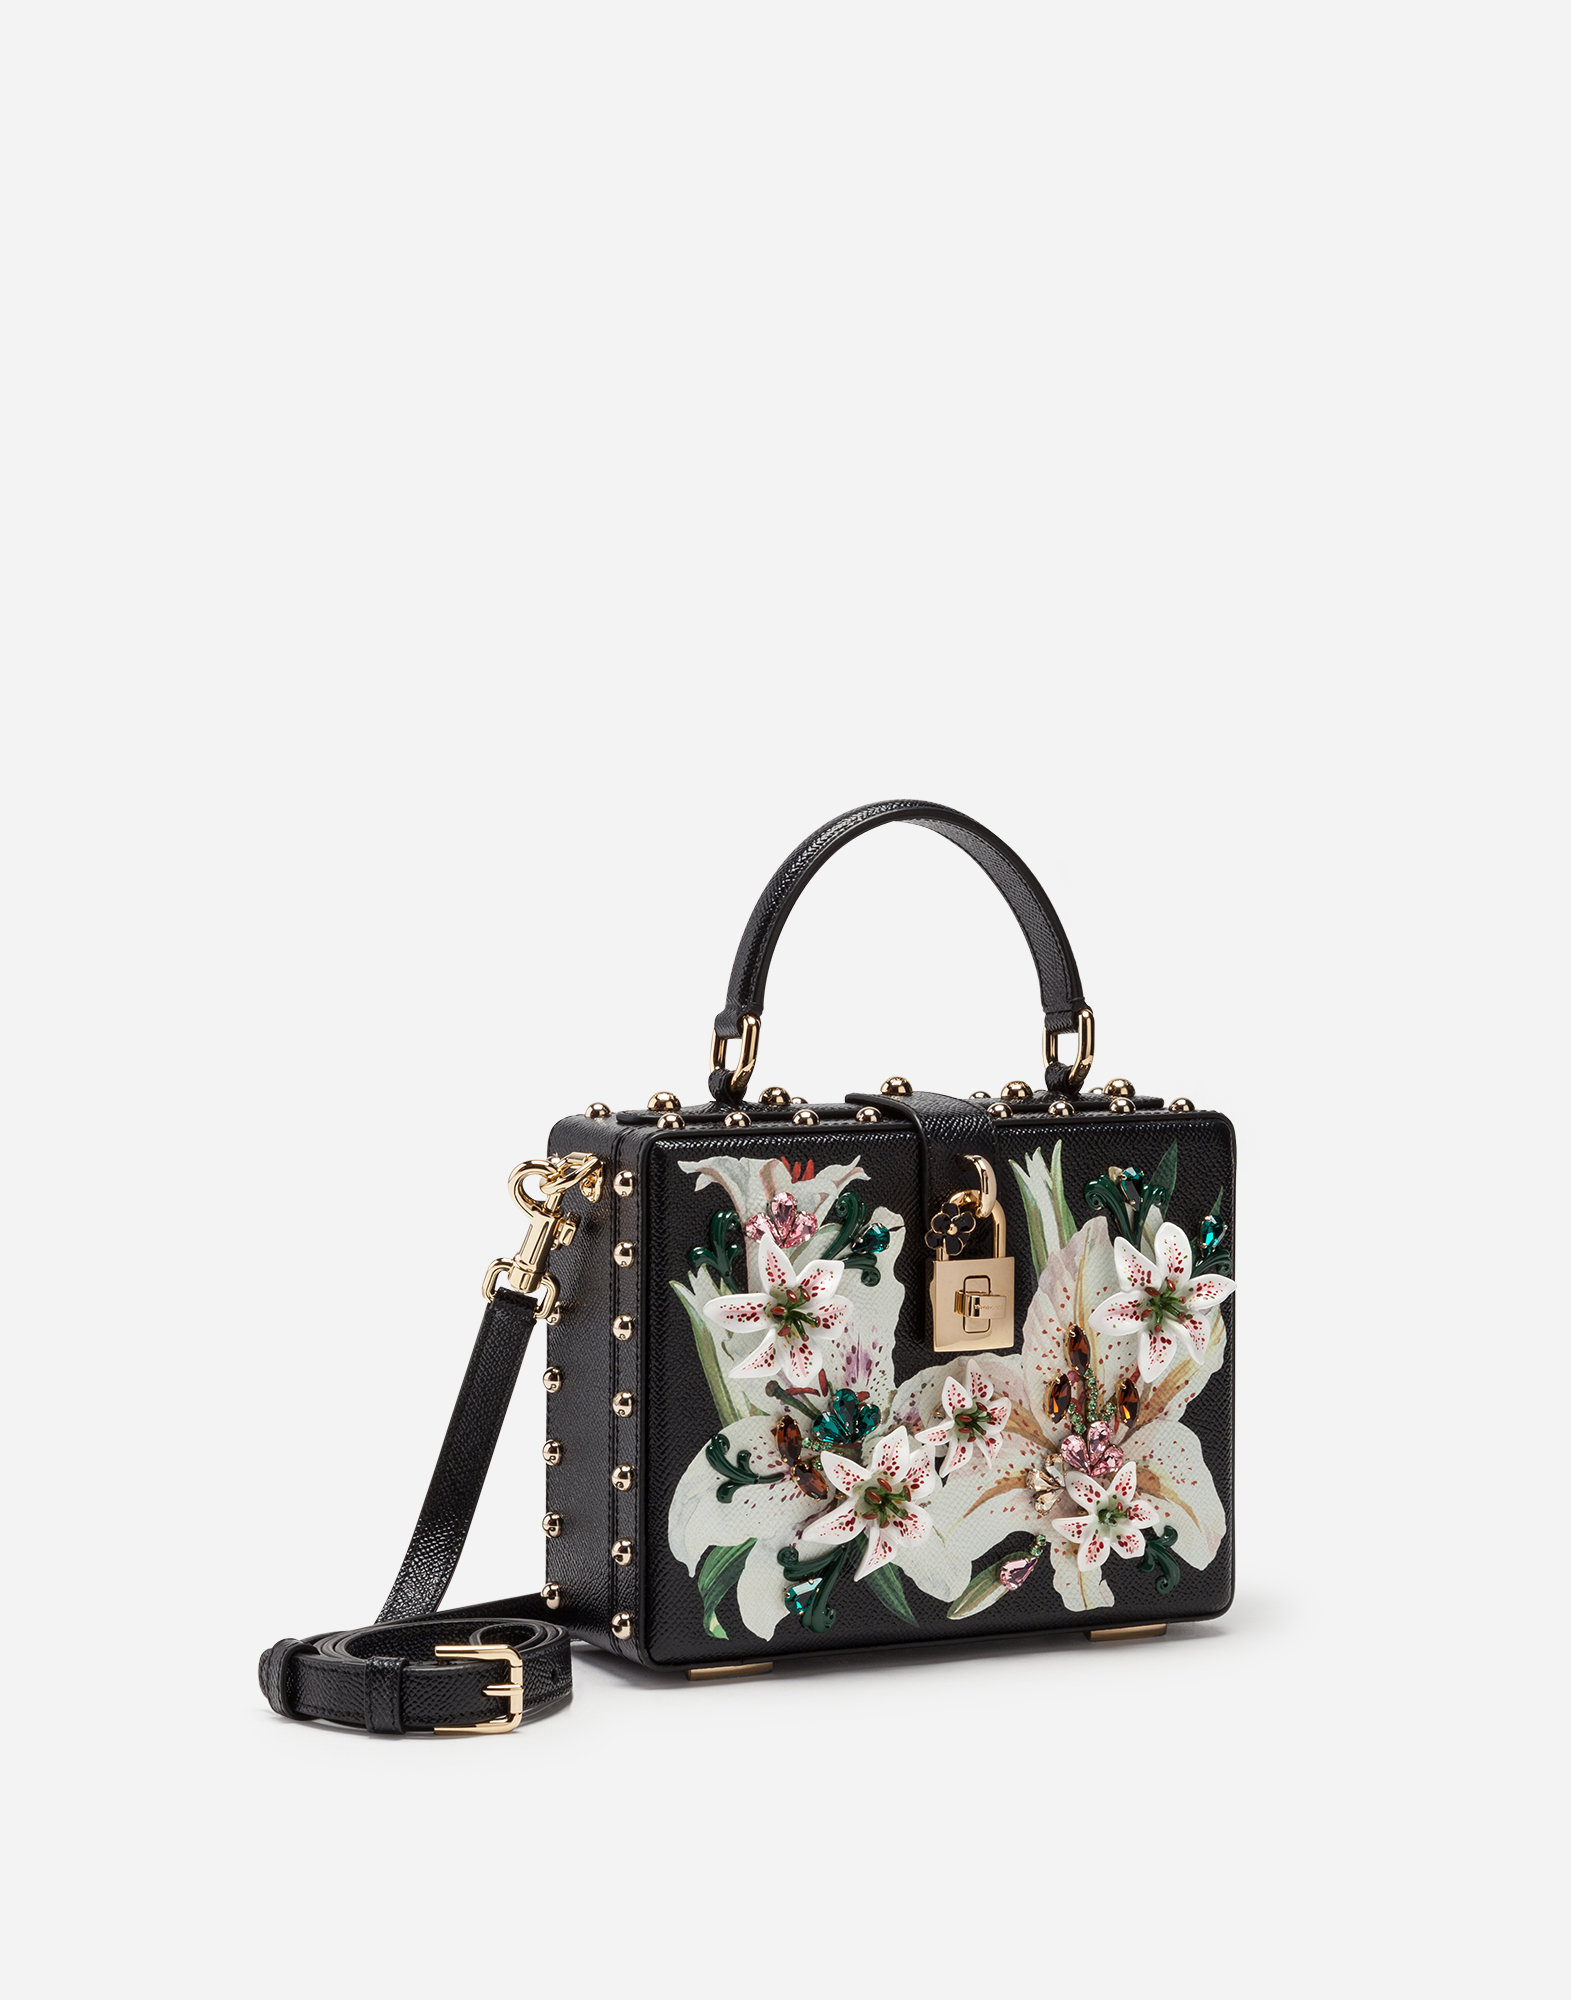 b951f767d9 Women's Handbags   Dolce&Gabbana - DOLCE BOX BAG IN LILY-PRINT ...